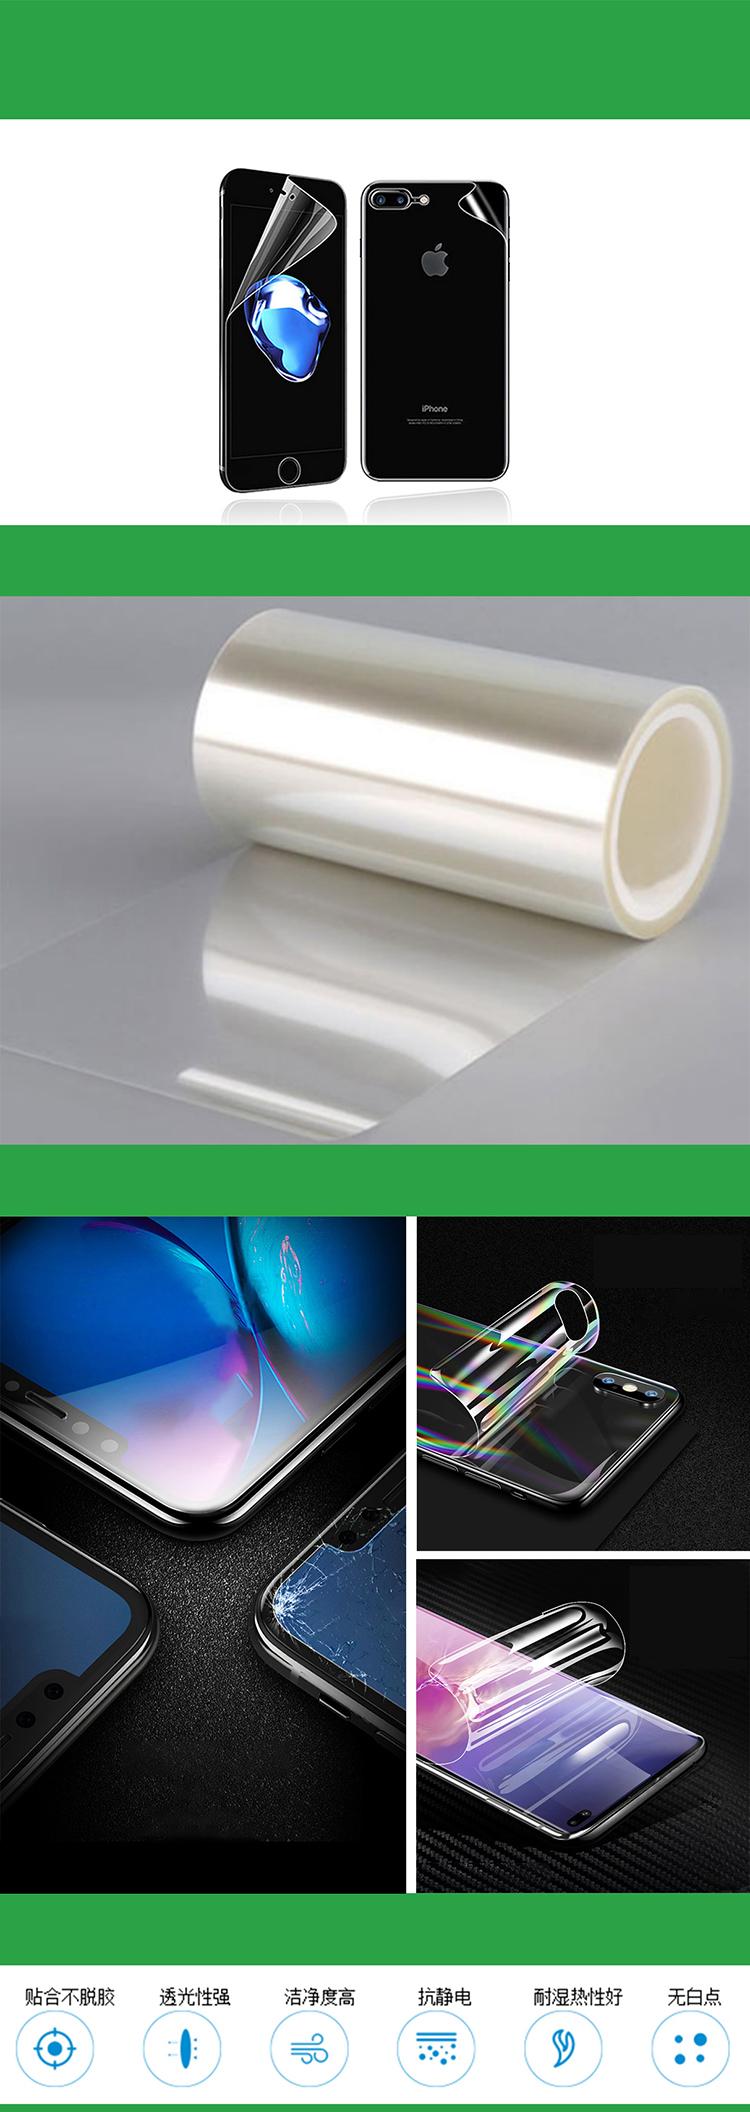 Wanban Mi 10 mobile phone screen protection film Scratch-resistant protective film for mobile phone screen